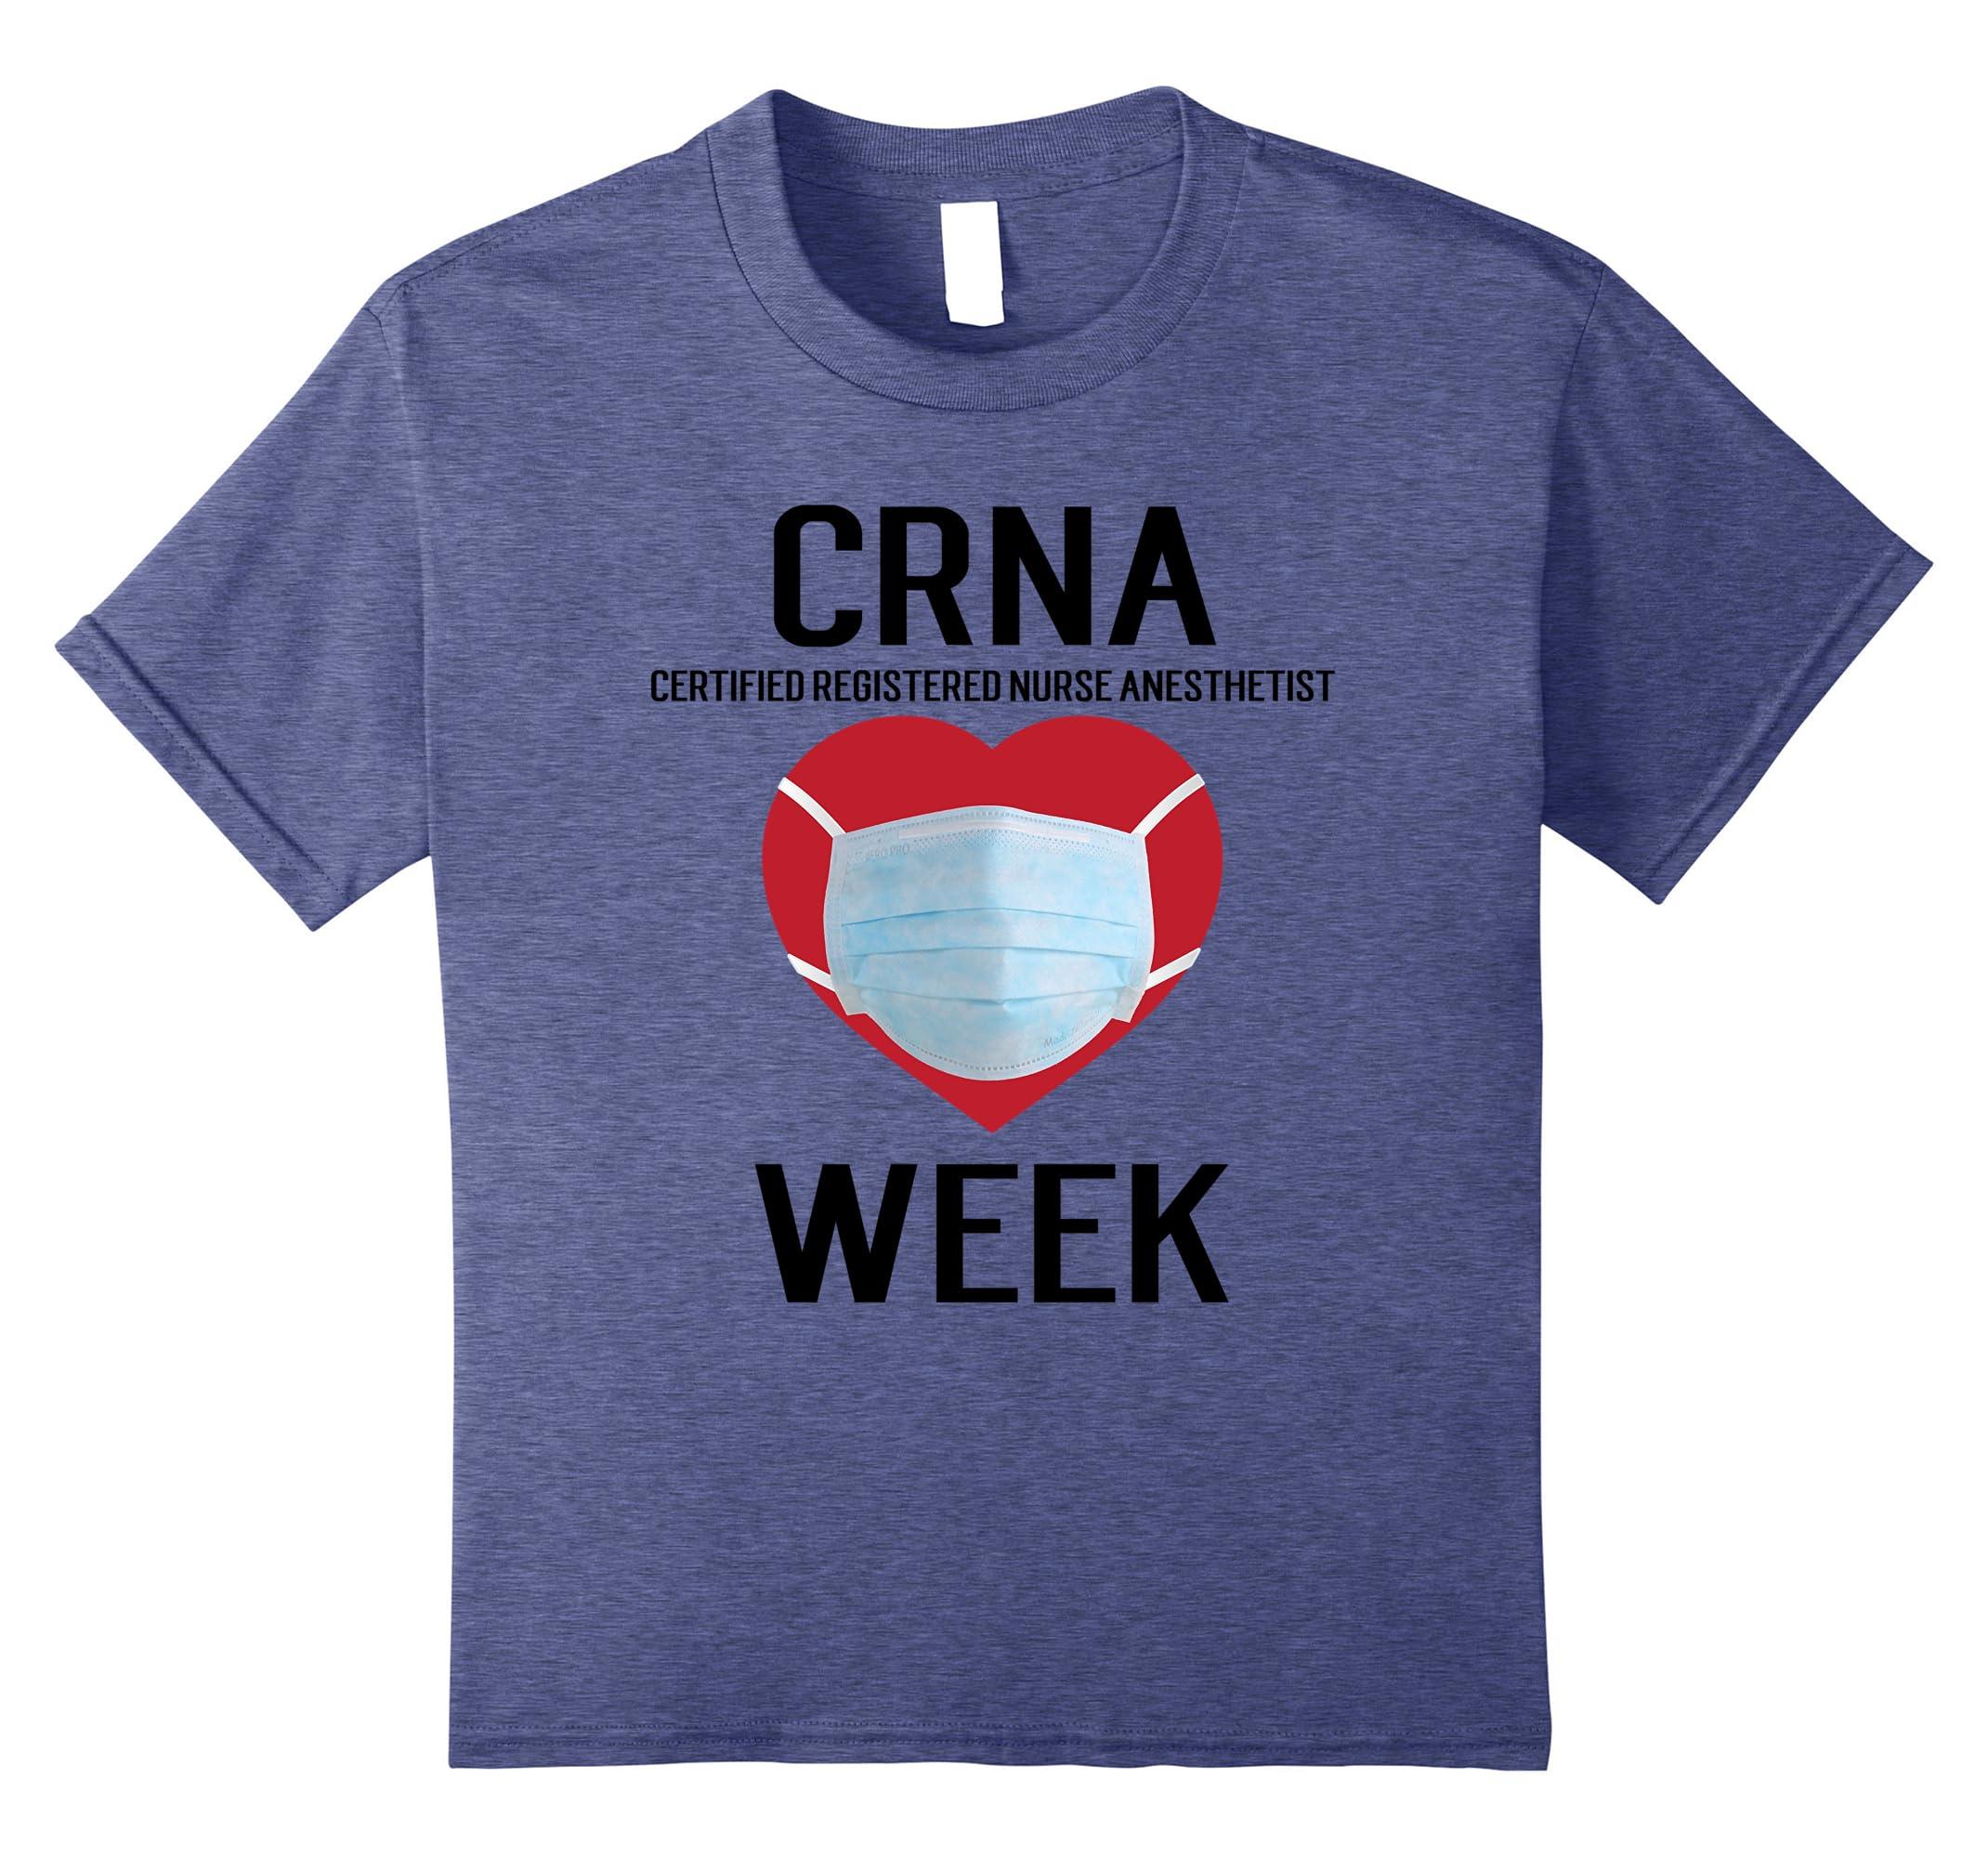 Amazon Crna Certified Registered Nurse Anesthetist Week T Shirt